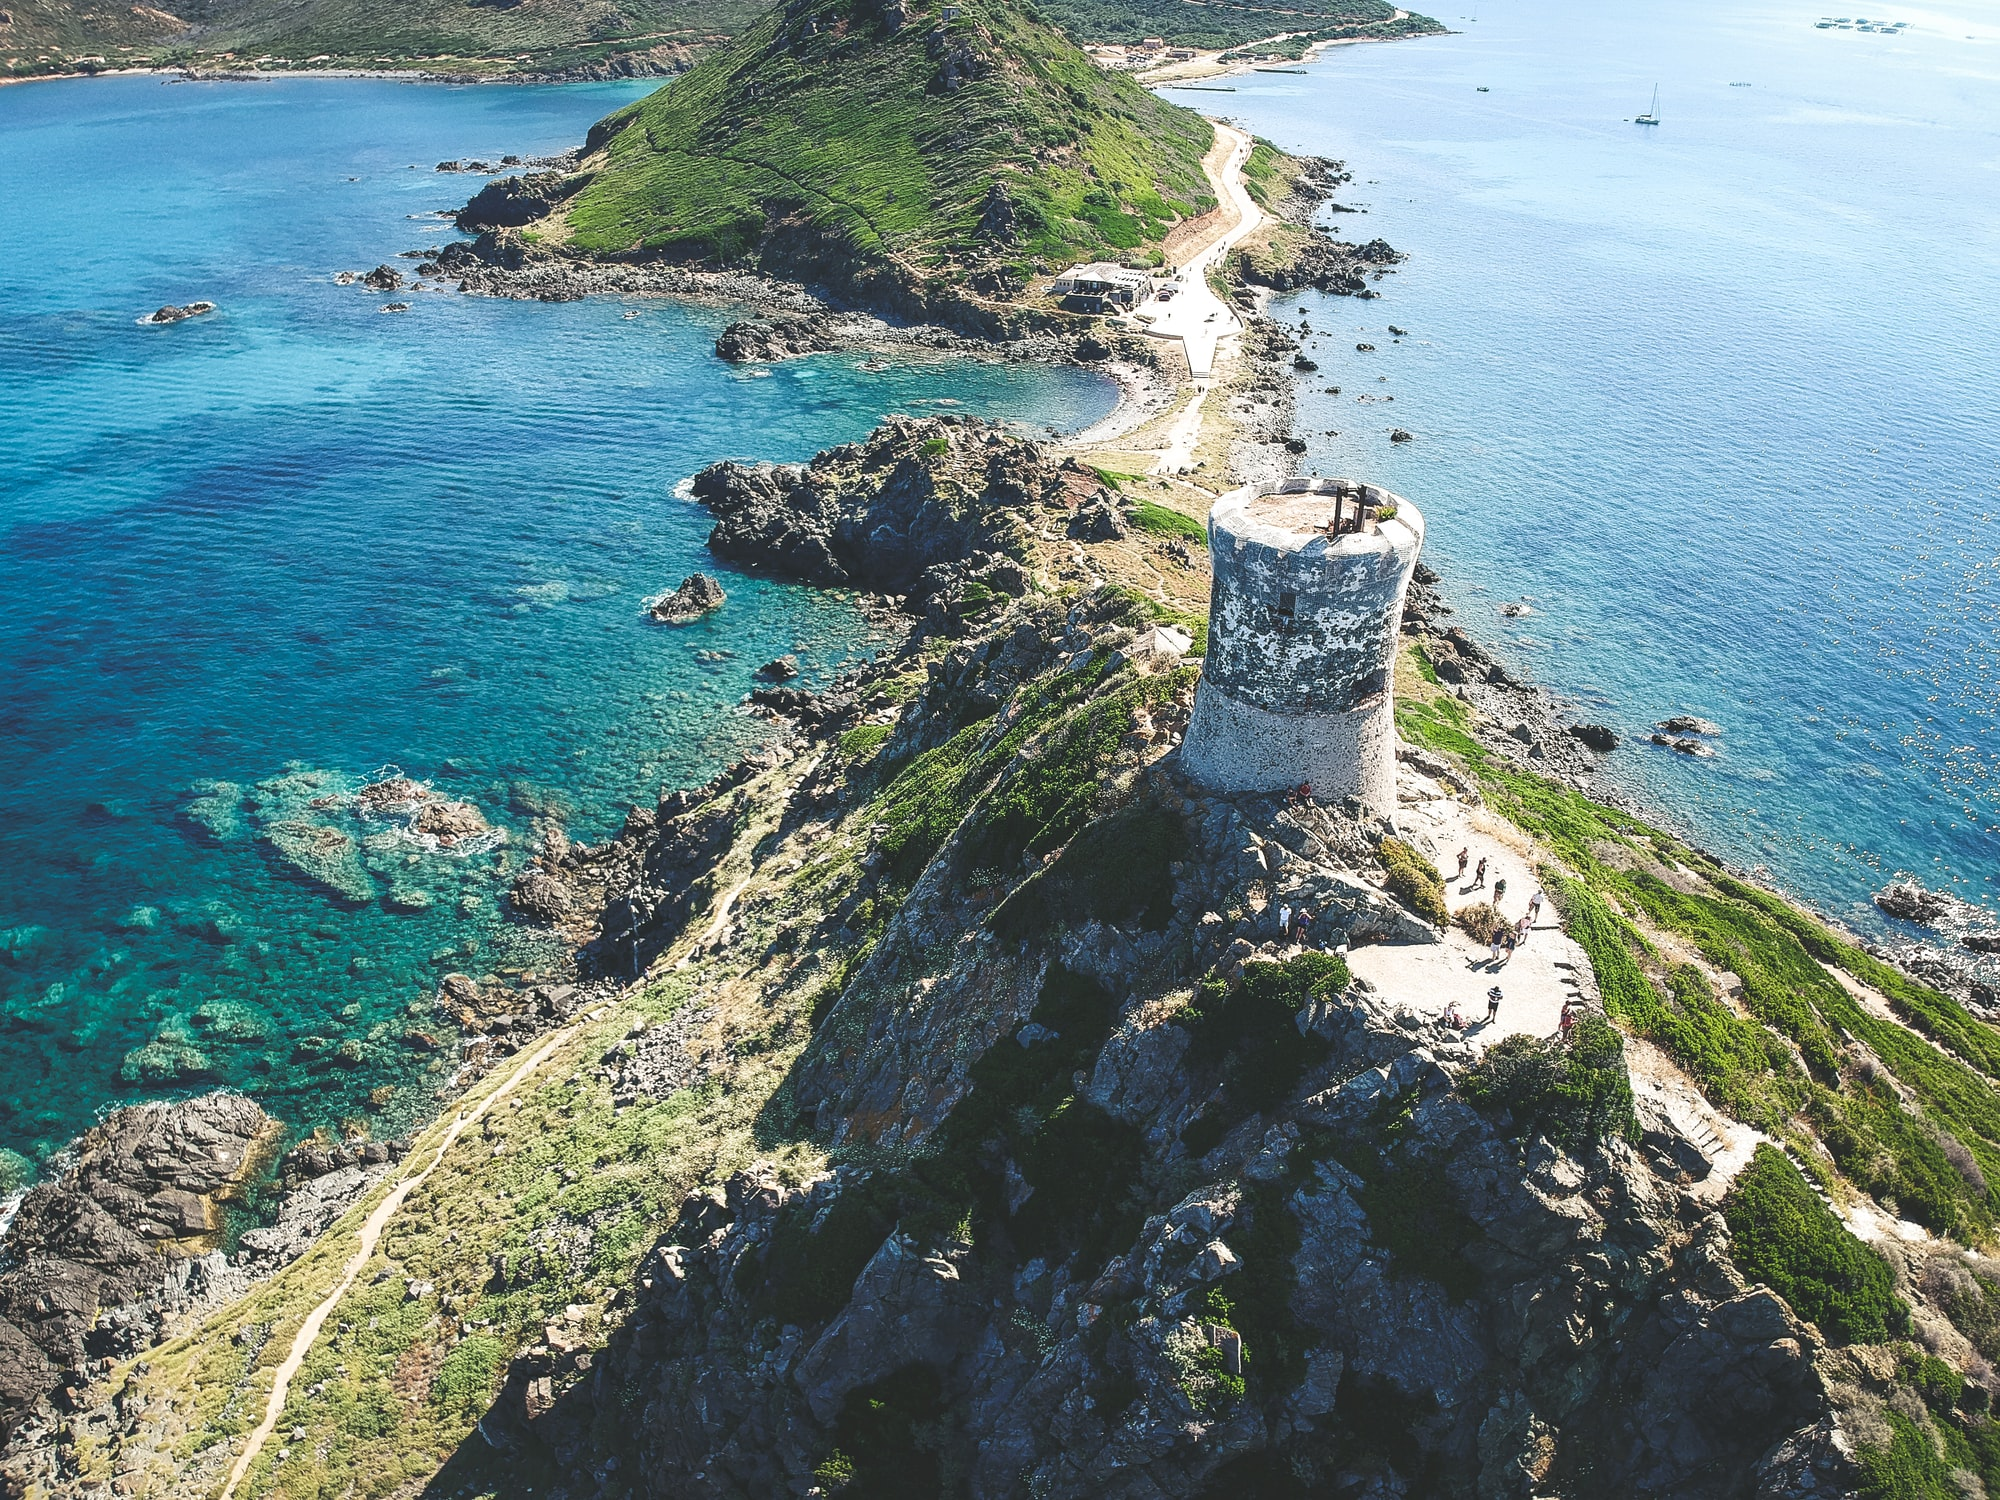 Pointe de Parata en Corse